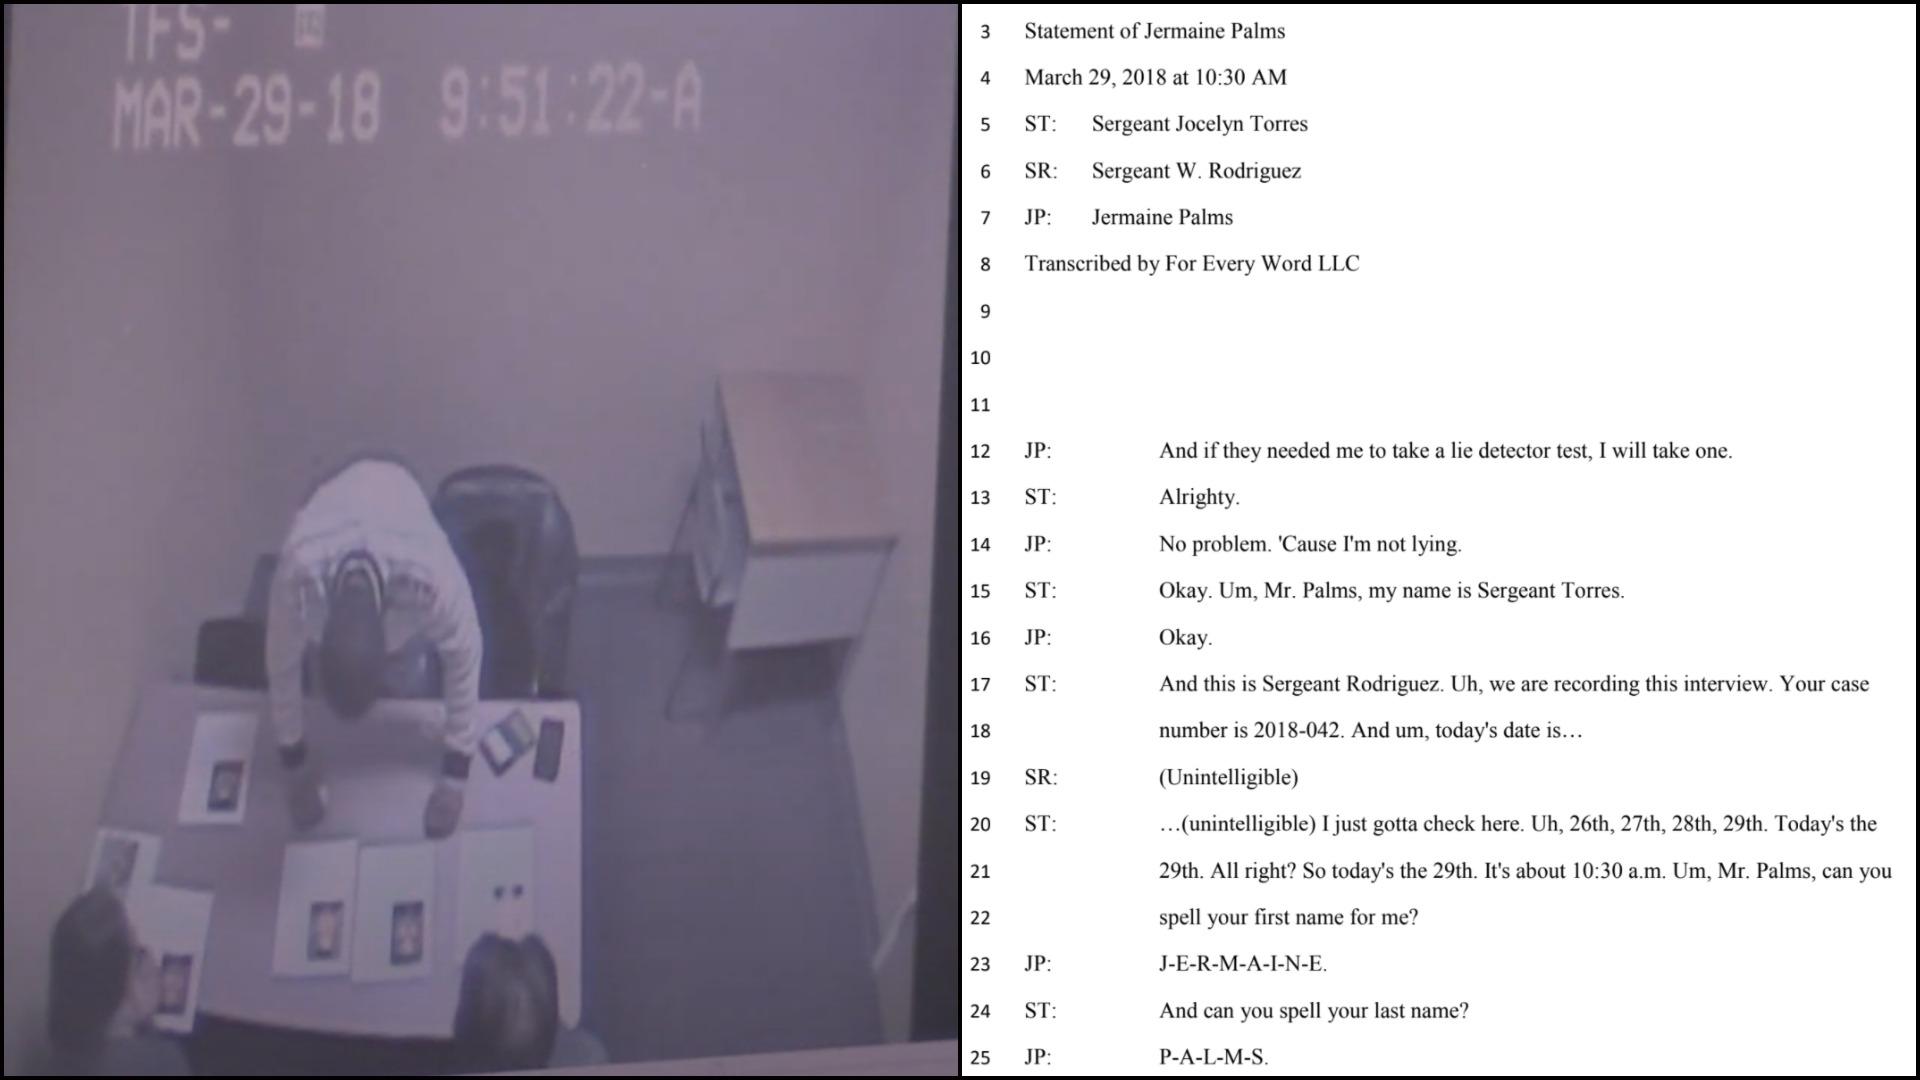 Sgt. Jocelyn Roldan (Torres) - Jersey City Internal Affairs - Transcript - CCTV timestamp